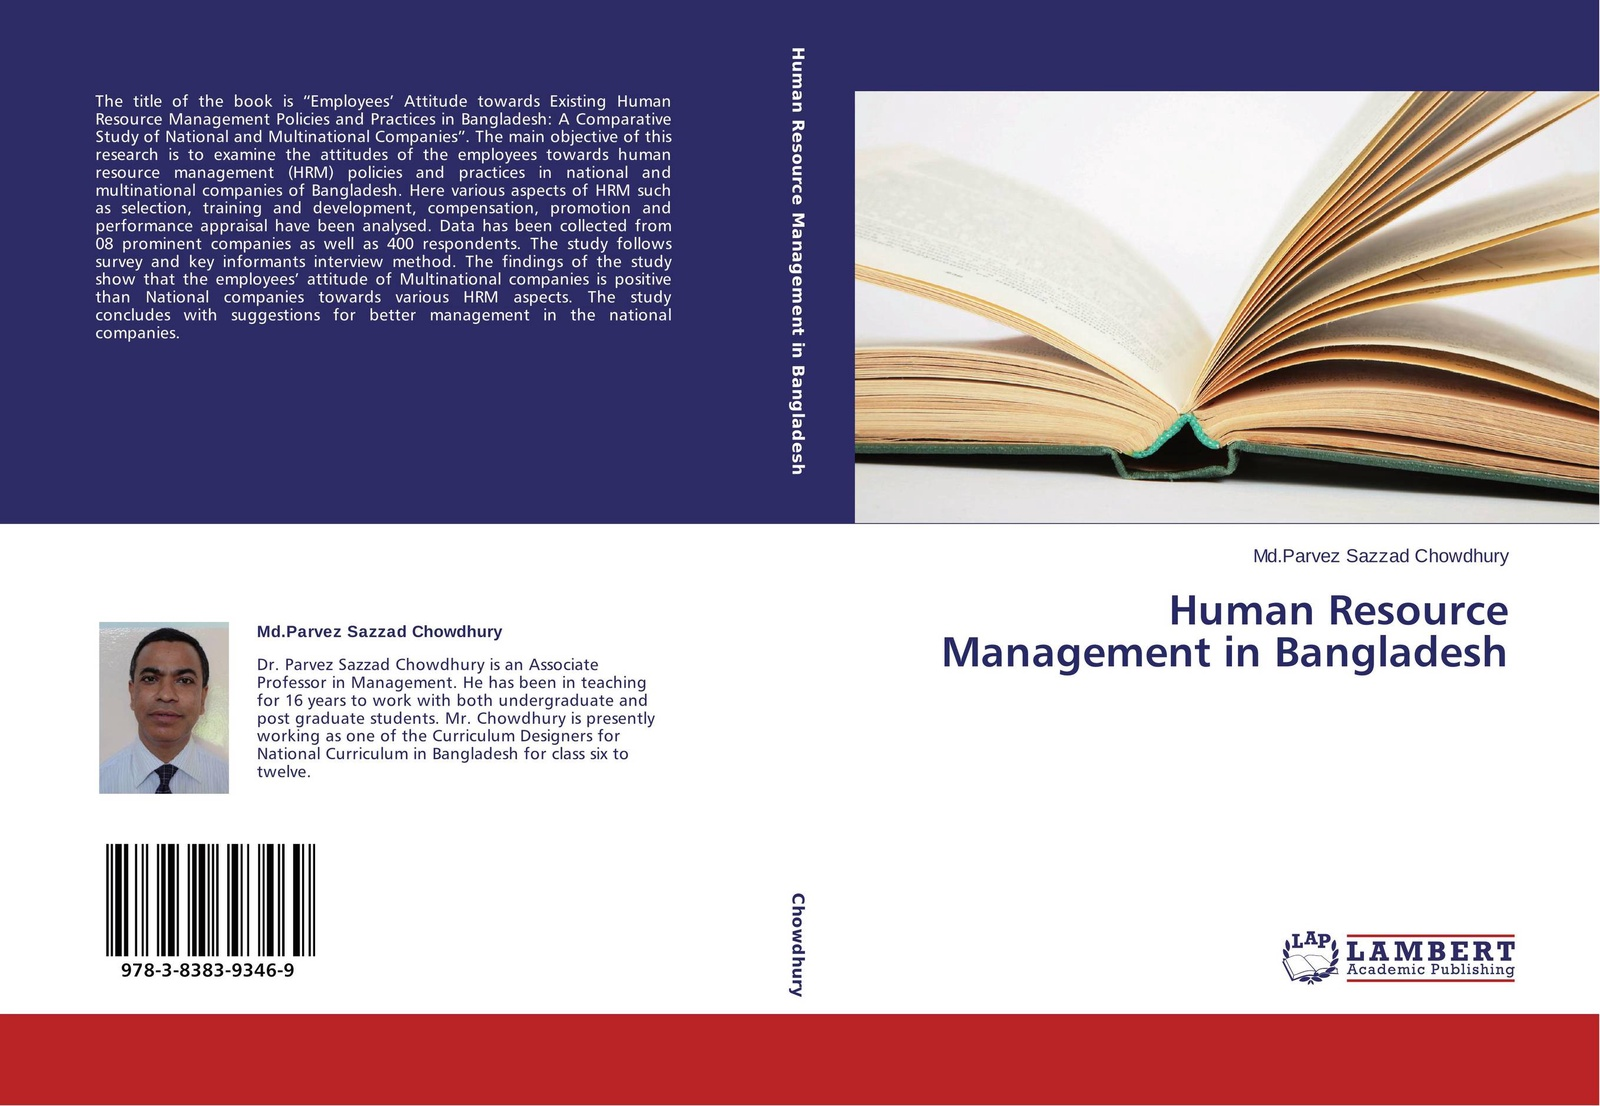 Md.Parvez Sazzad Chowdhury Human Resource Management in Bangladesh study attitude and academic performance